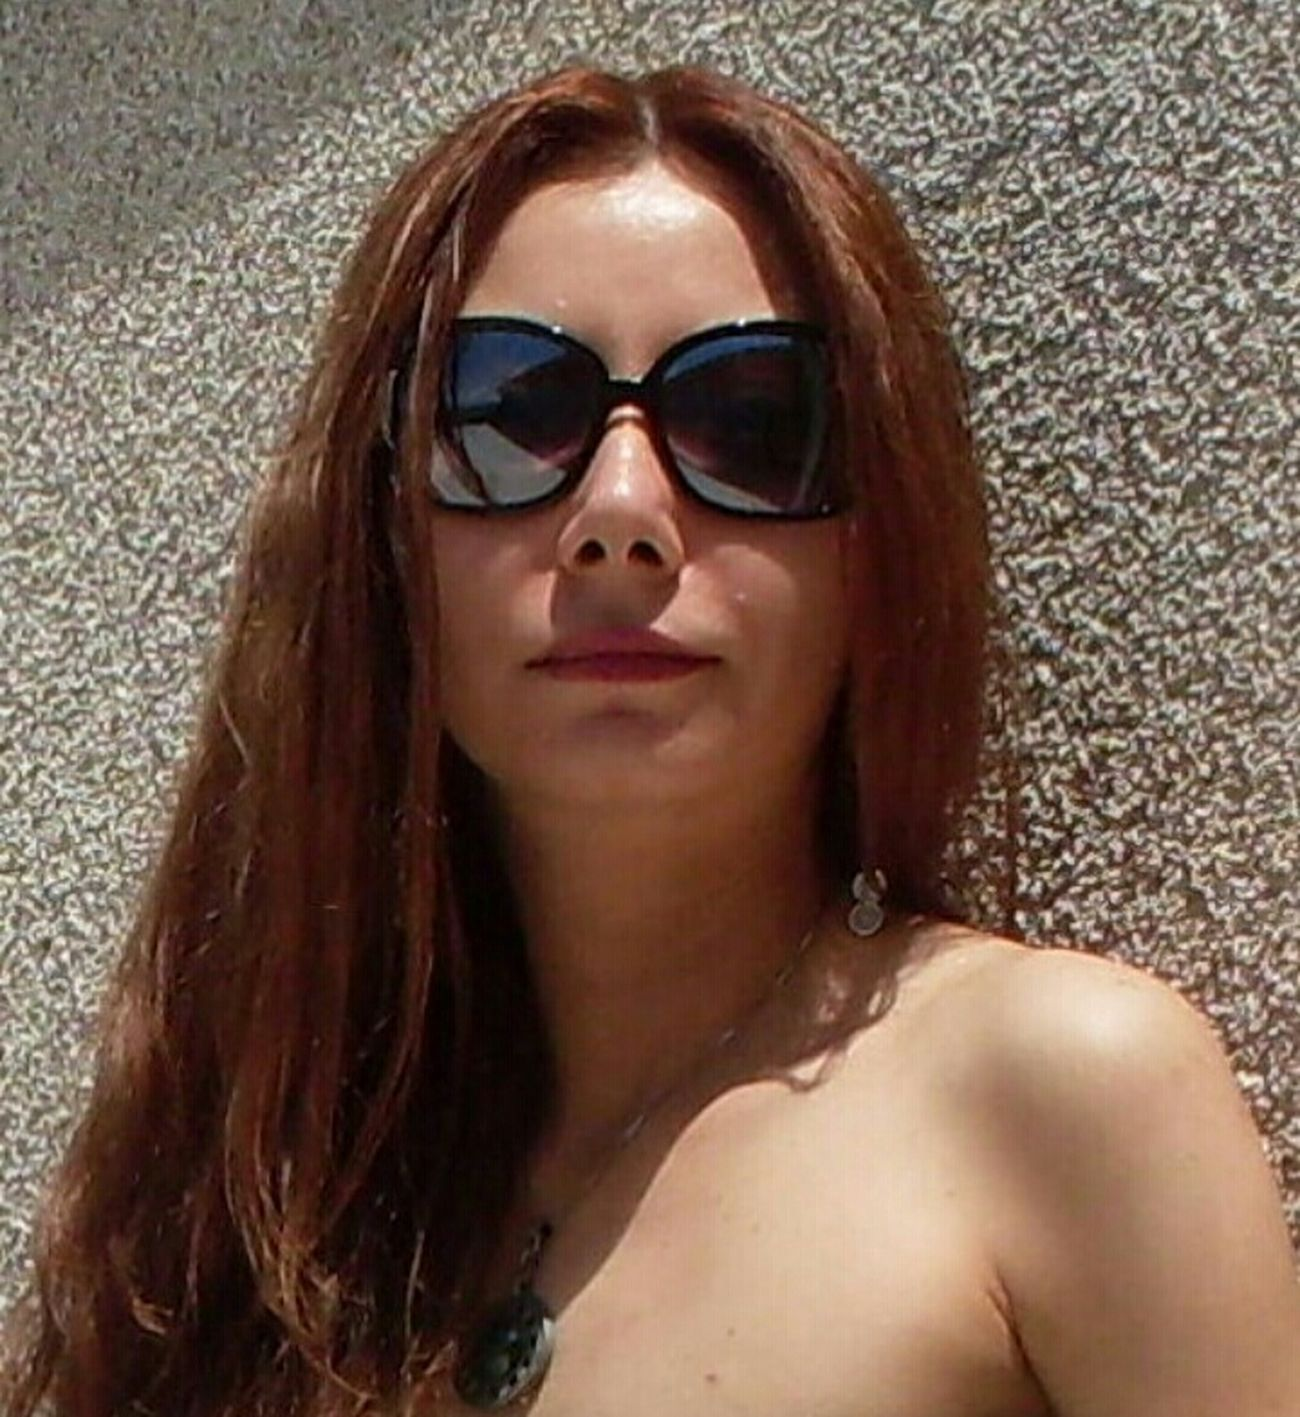 That's Me Womenpower EyeEm Gallery Faces Of EyeEm Cerkes Photography Enjoying Life Portrait Hair